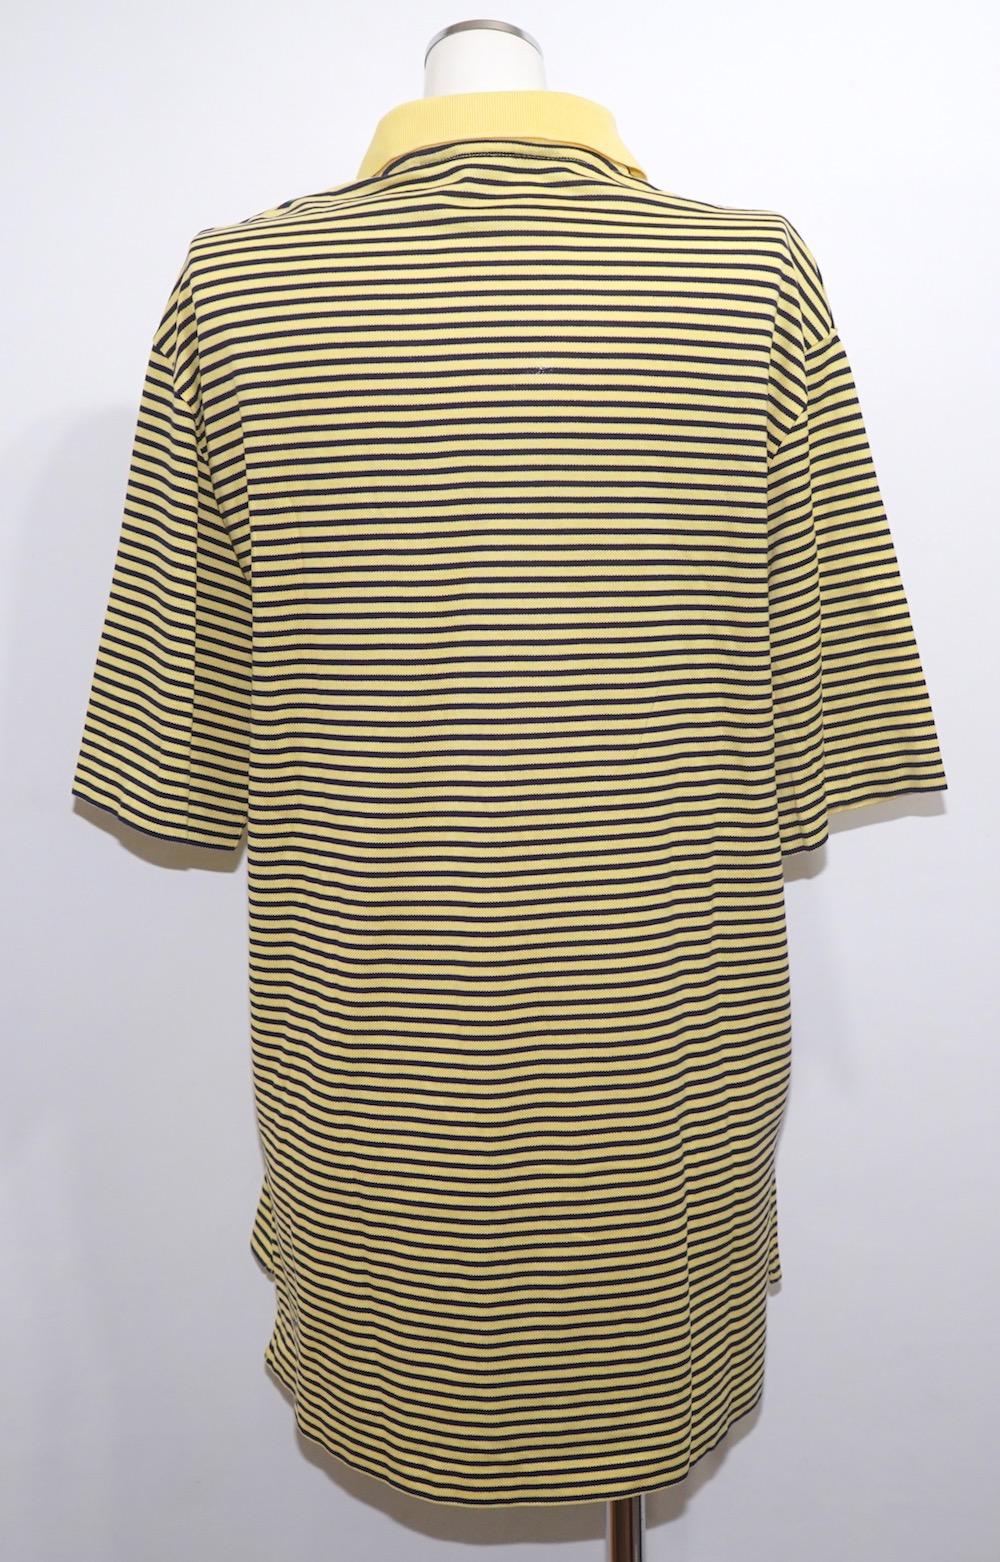 """Ralph Lauren"" Border Polo Shirts (yellow/black)"